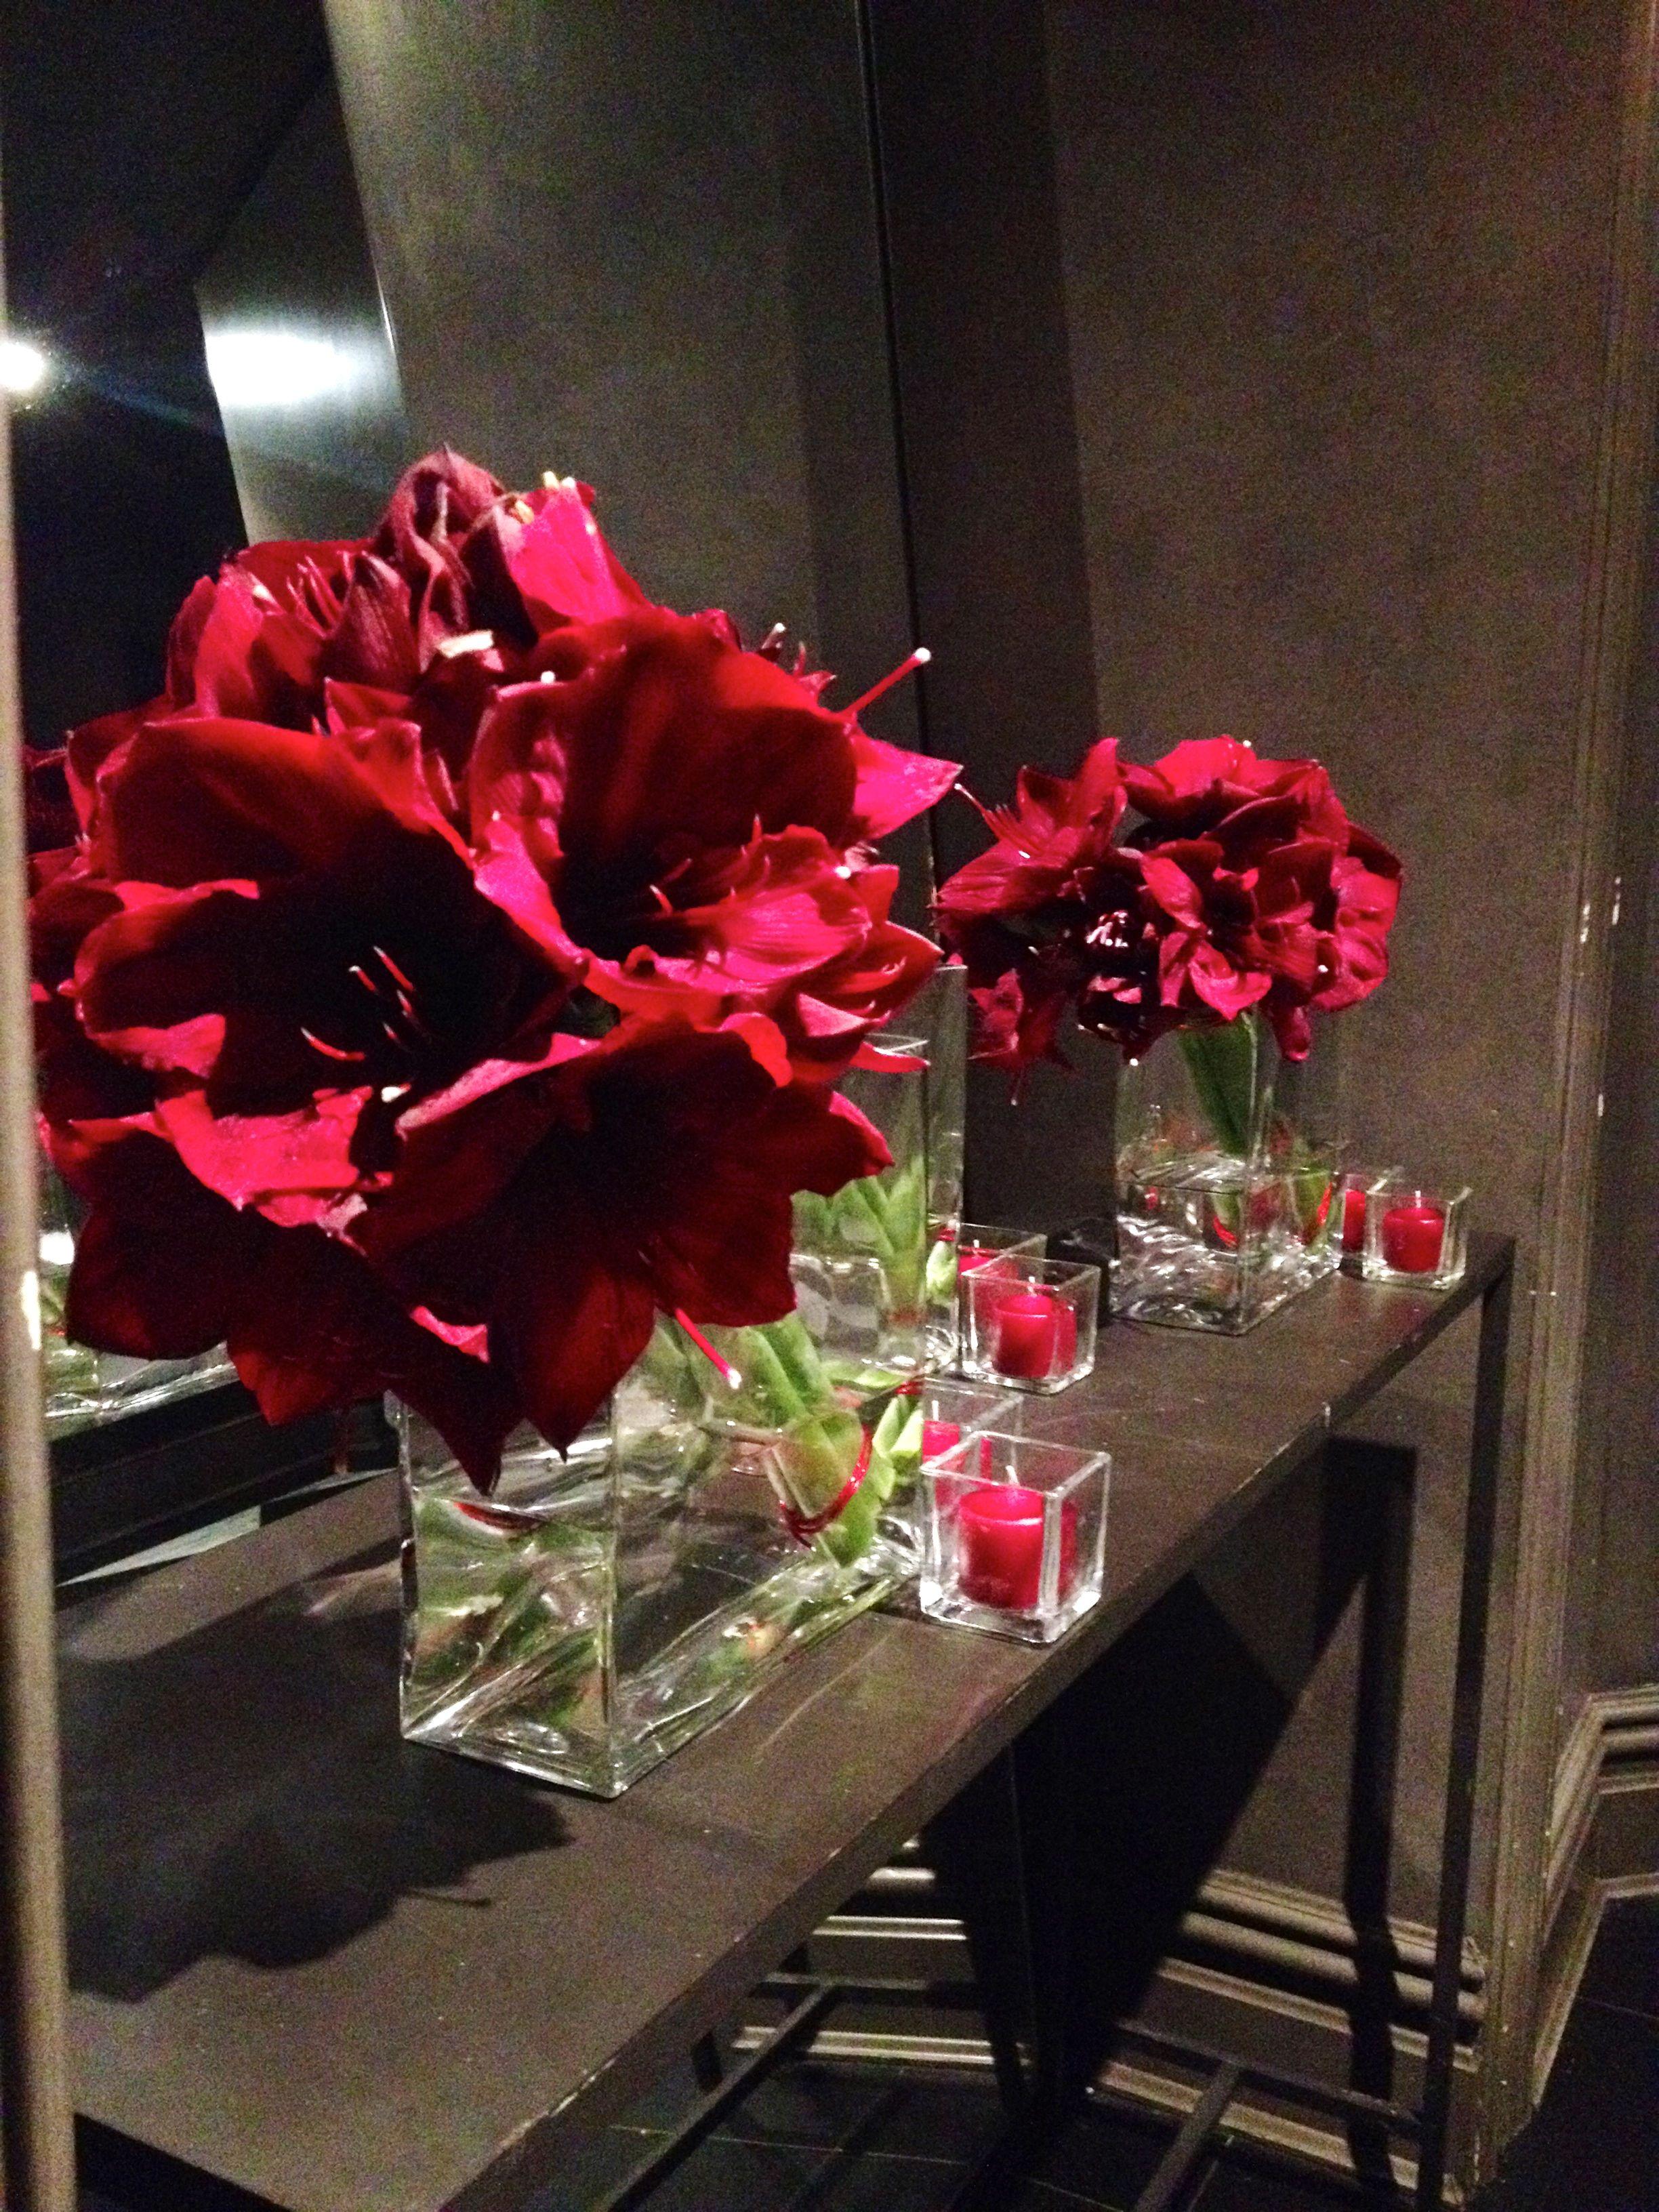 Leaning burgundy amaryllis for maybourne hotel groups private event leaning burgundy amaryllis for maybourne hotel groups private event at crown restaurant flowers of the izmirmasajfo